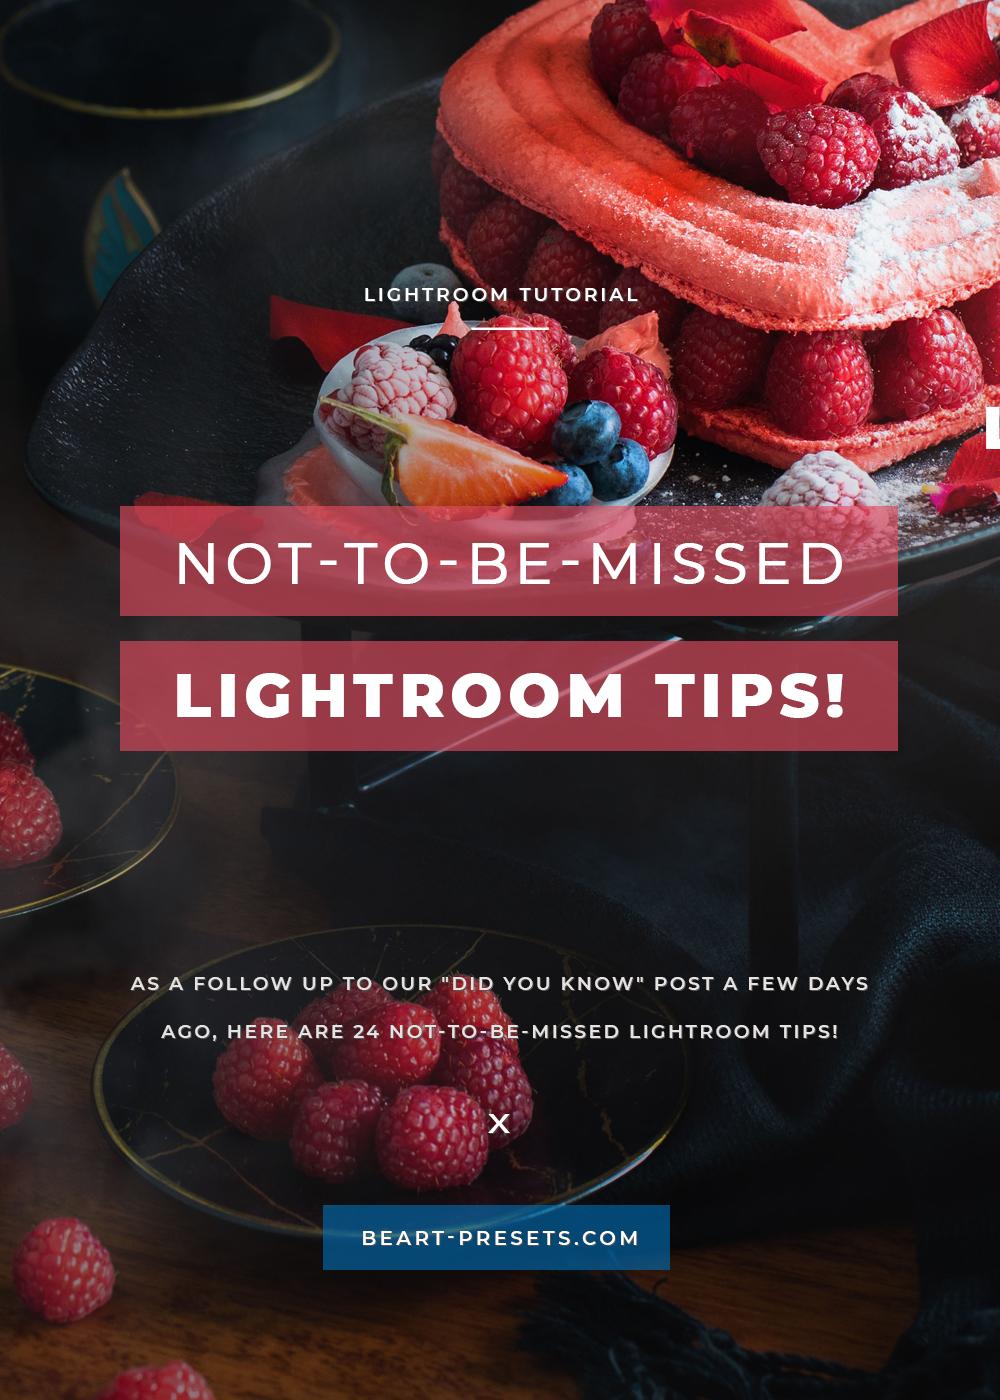 BEST LIGHTROOM TIPS BY BEART